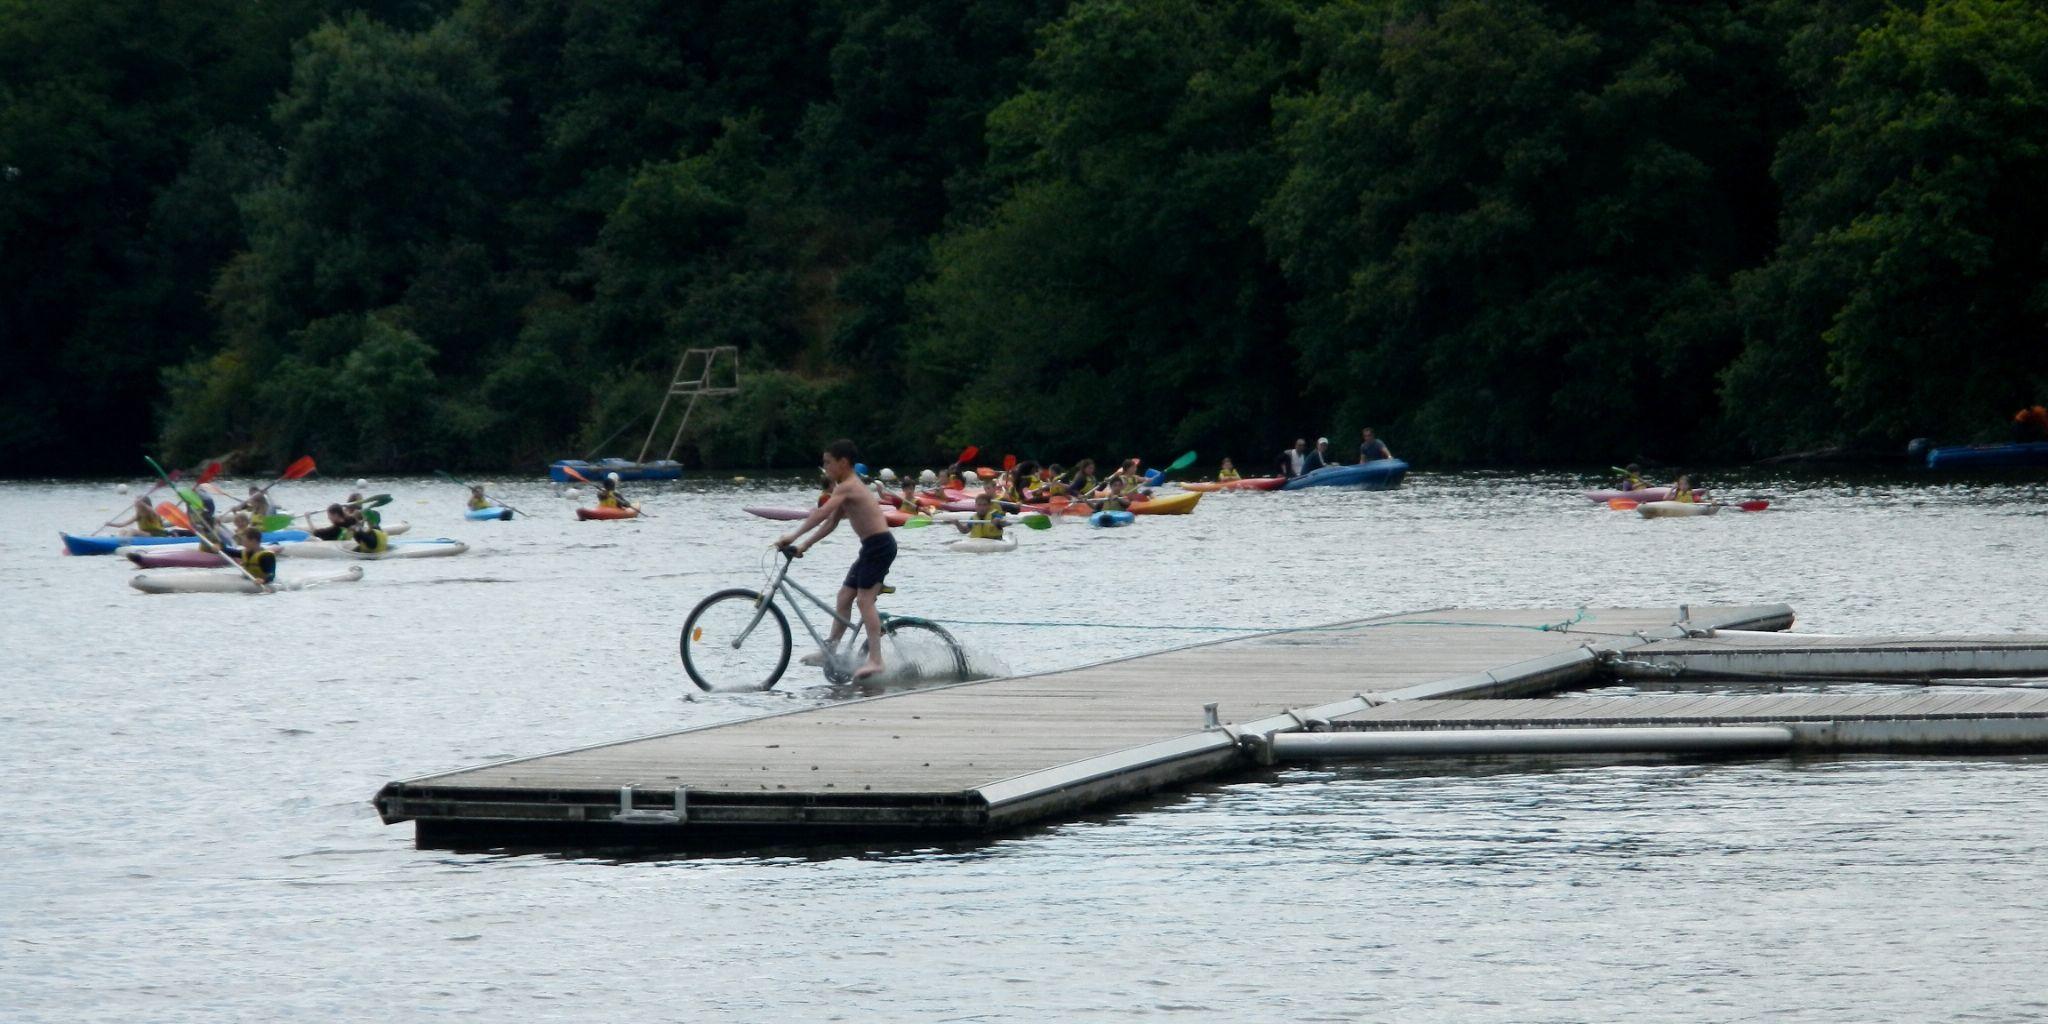 DSCN6033 je roule sur l'eau  by pawel2reklewski